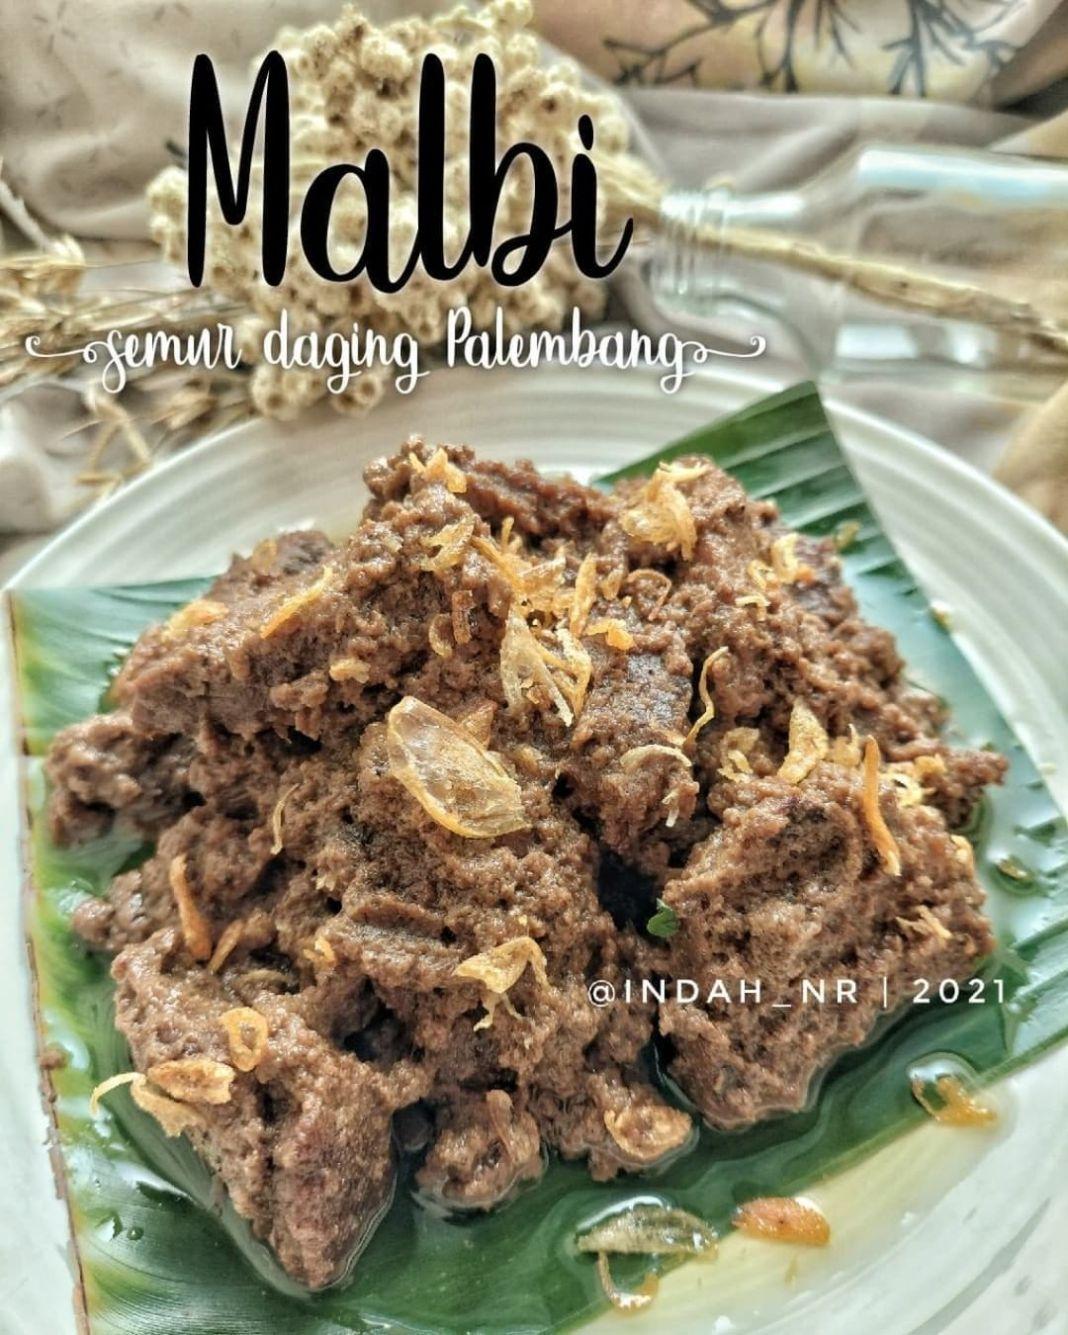 Info kuliner, Malbi ini sejenis semur daging khas Palembang Sumatera Selatan. Bumbunya berlimpah rempah makan…